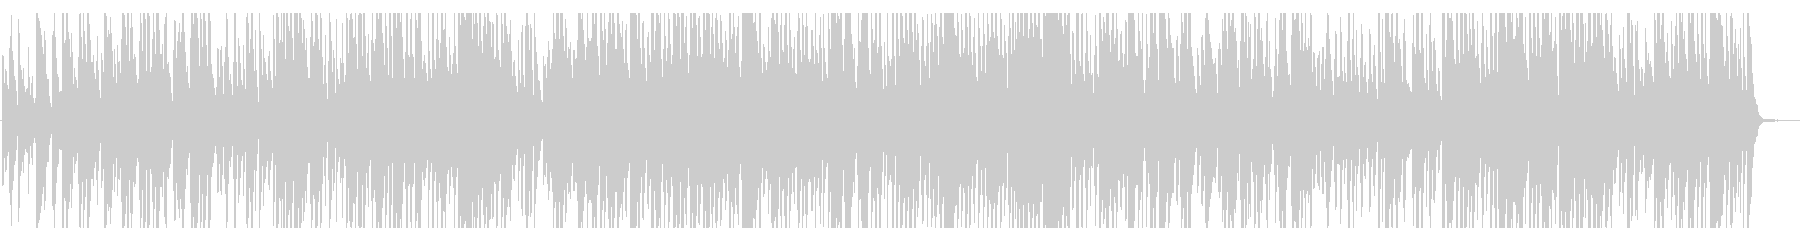 jazz ほのぼの 優雅 ティータイム の未再生の波形